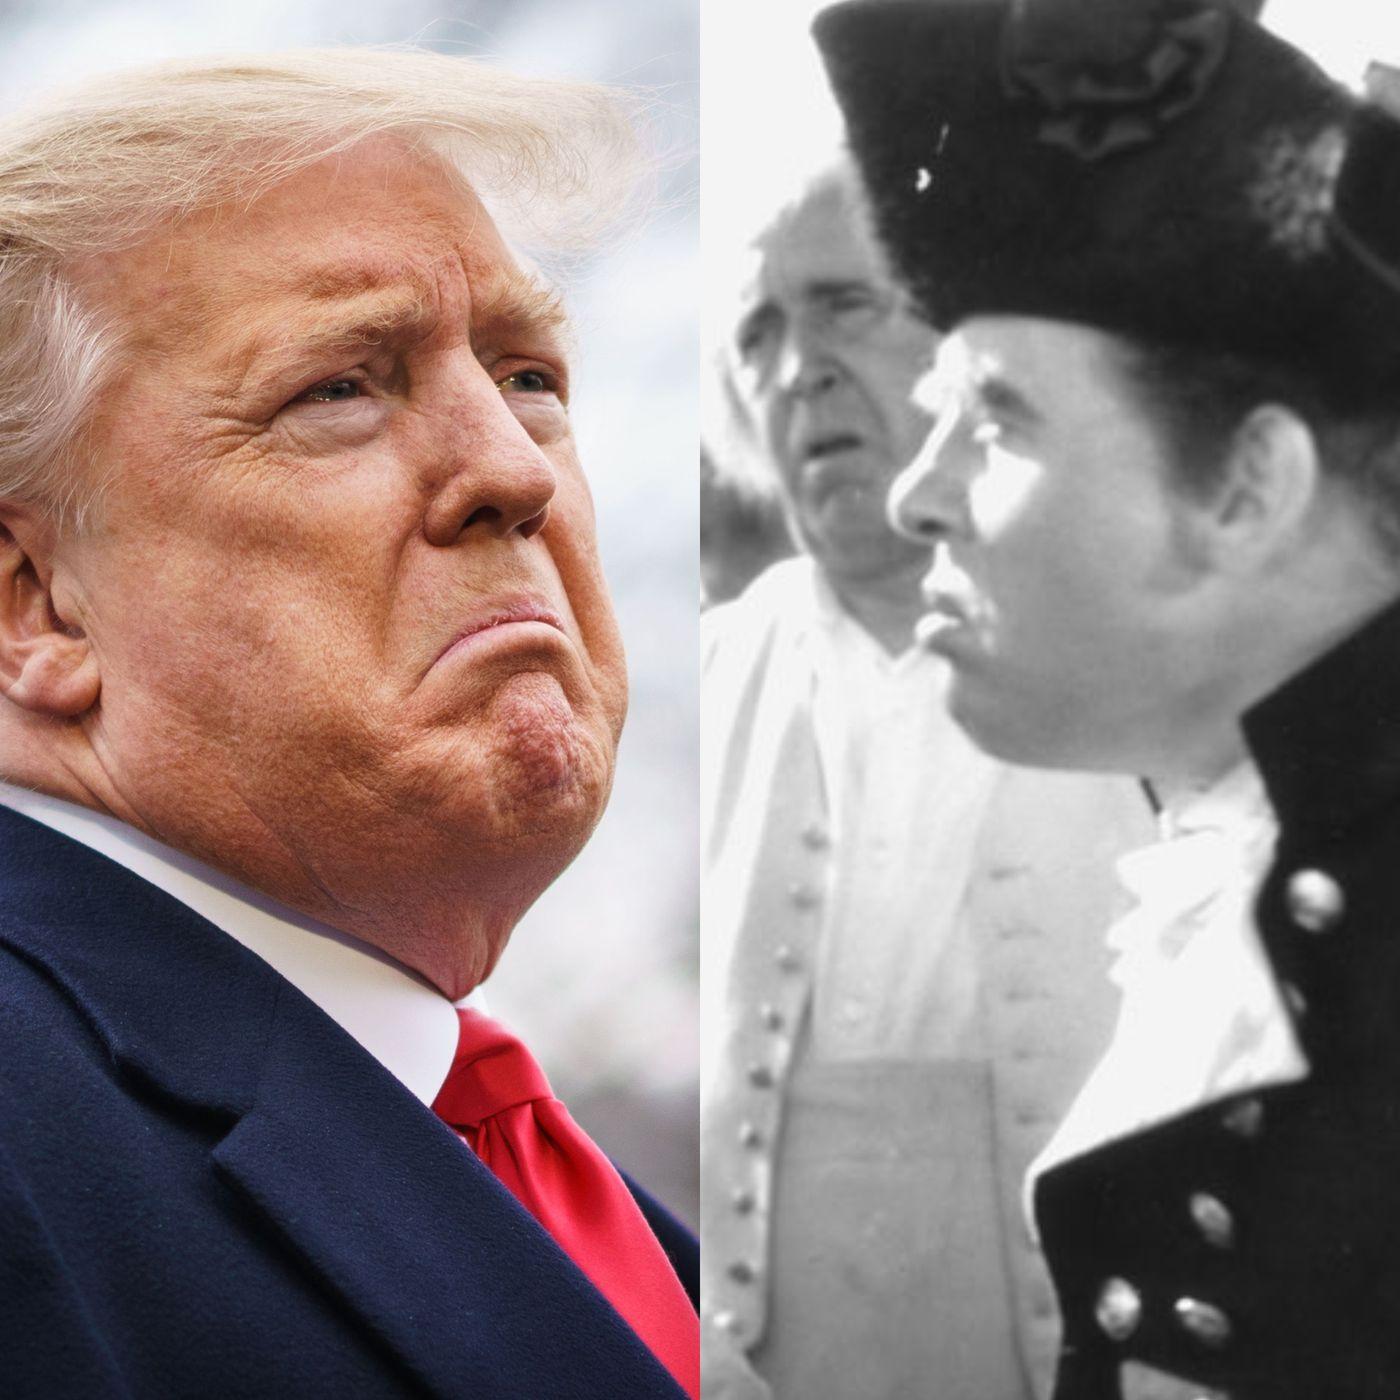 Trump's bizarre Mutiny on the Bounty tweet is revealing - Vox